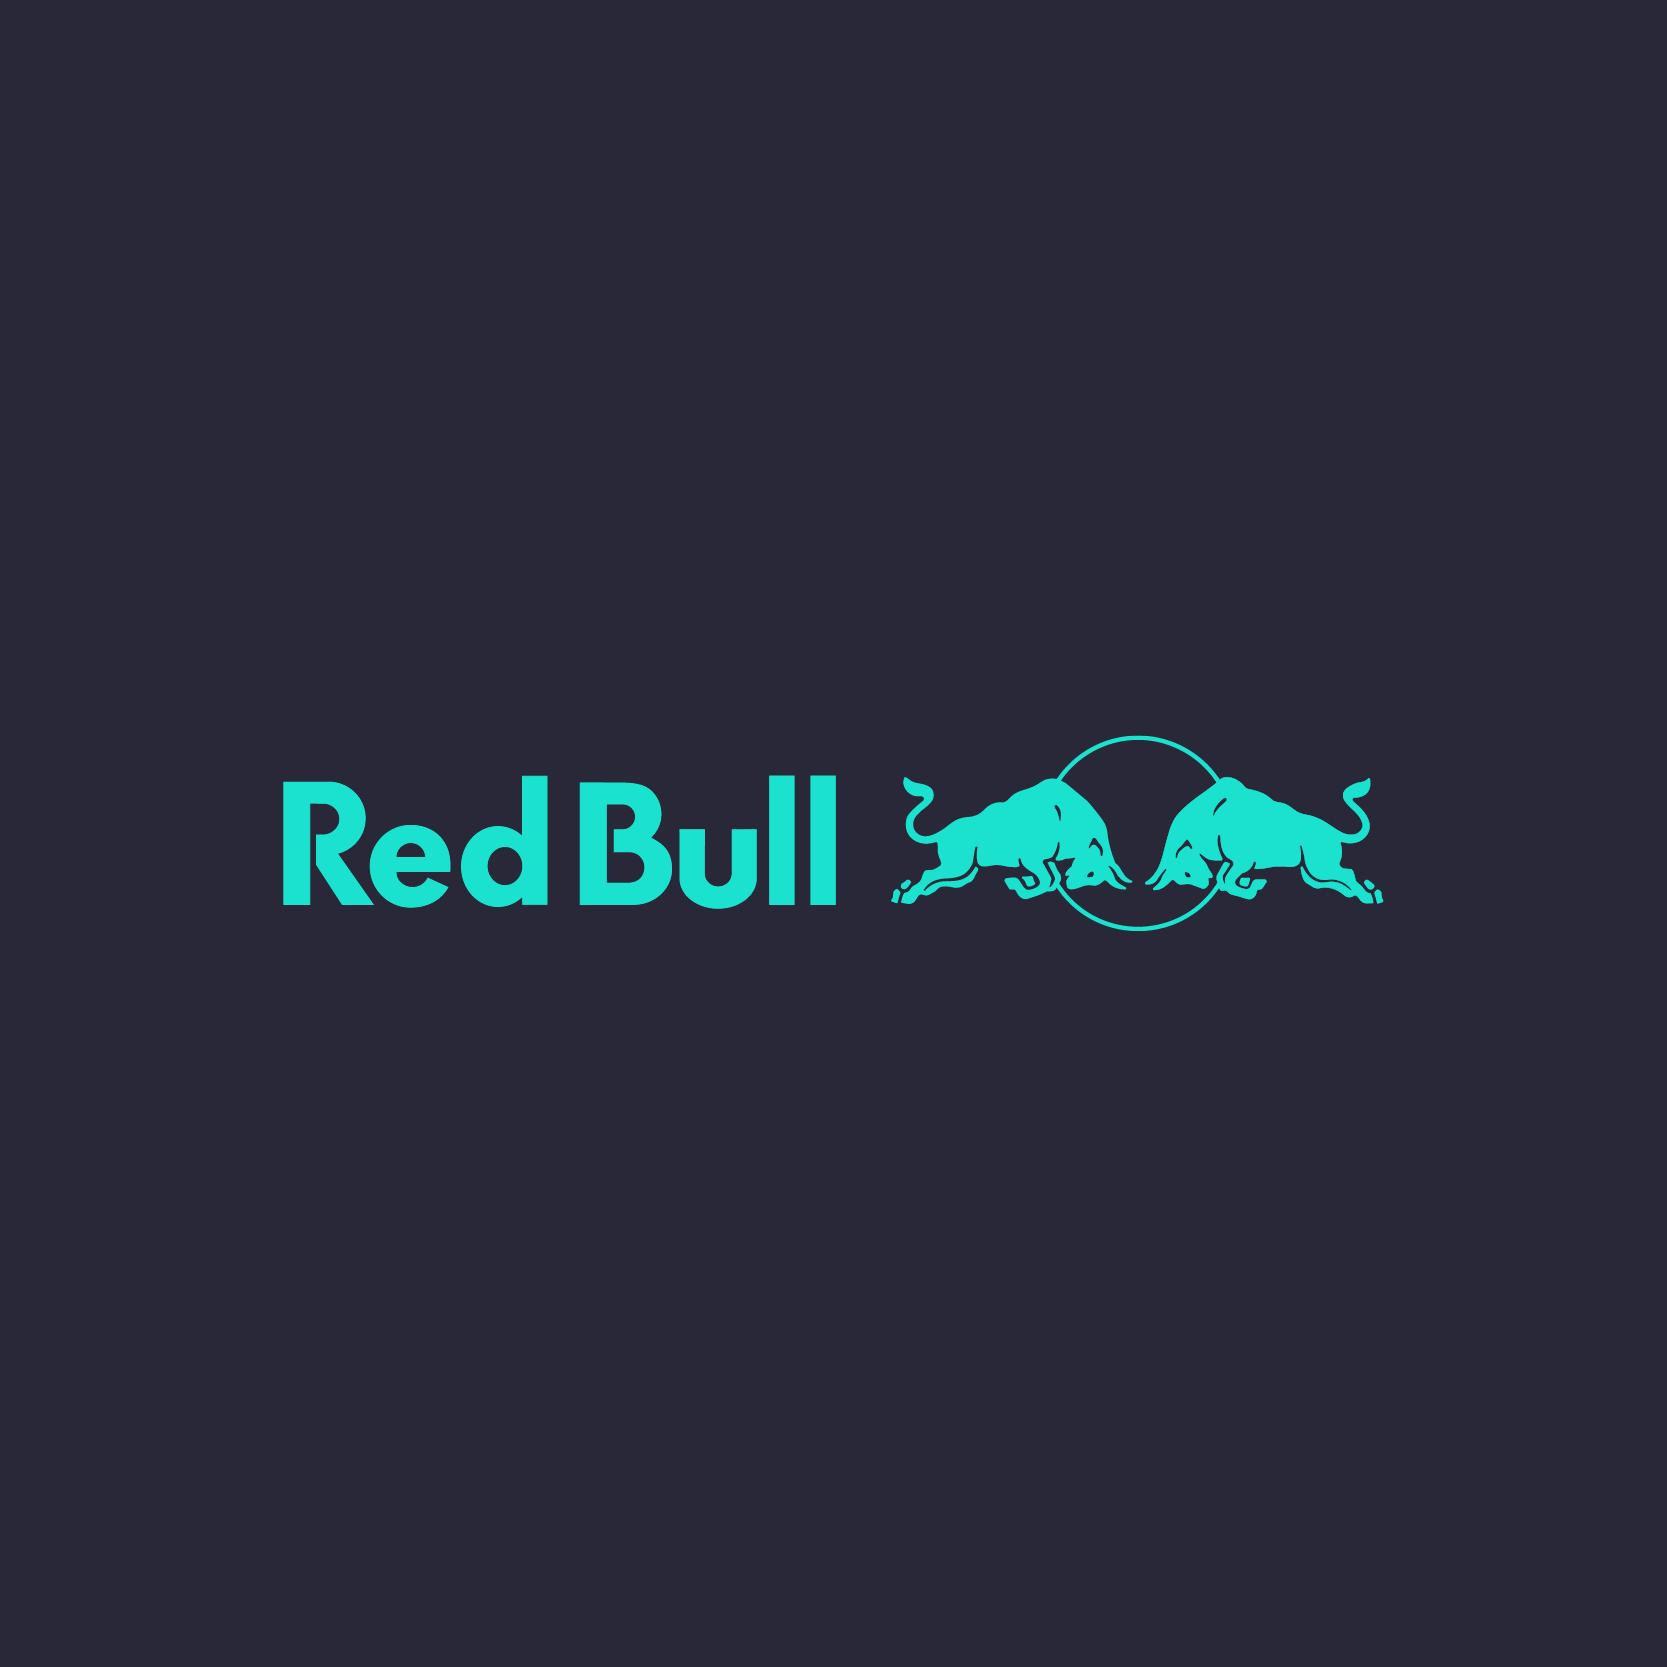 Logos_Bed_Bull_Logo.png